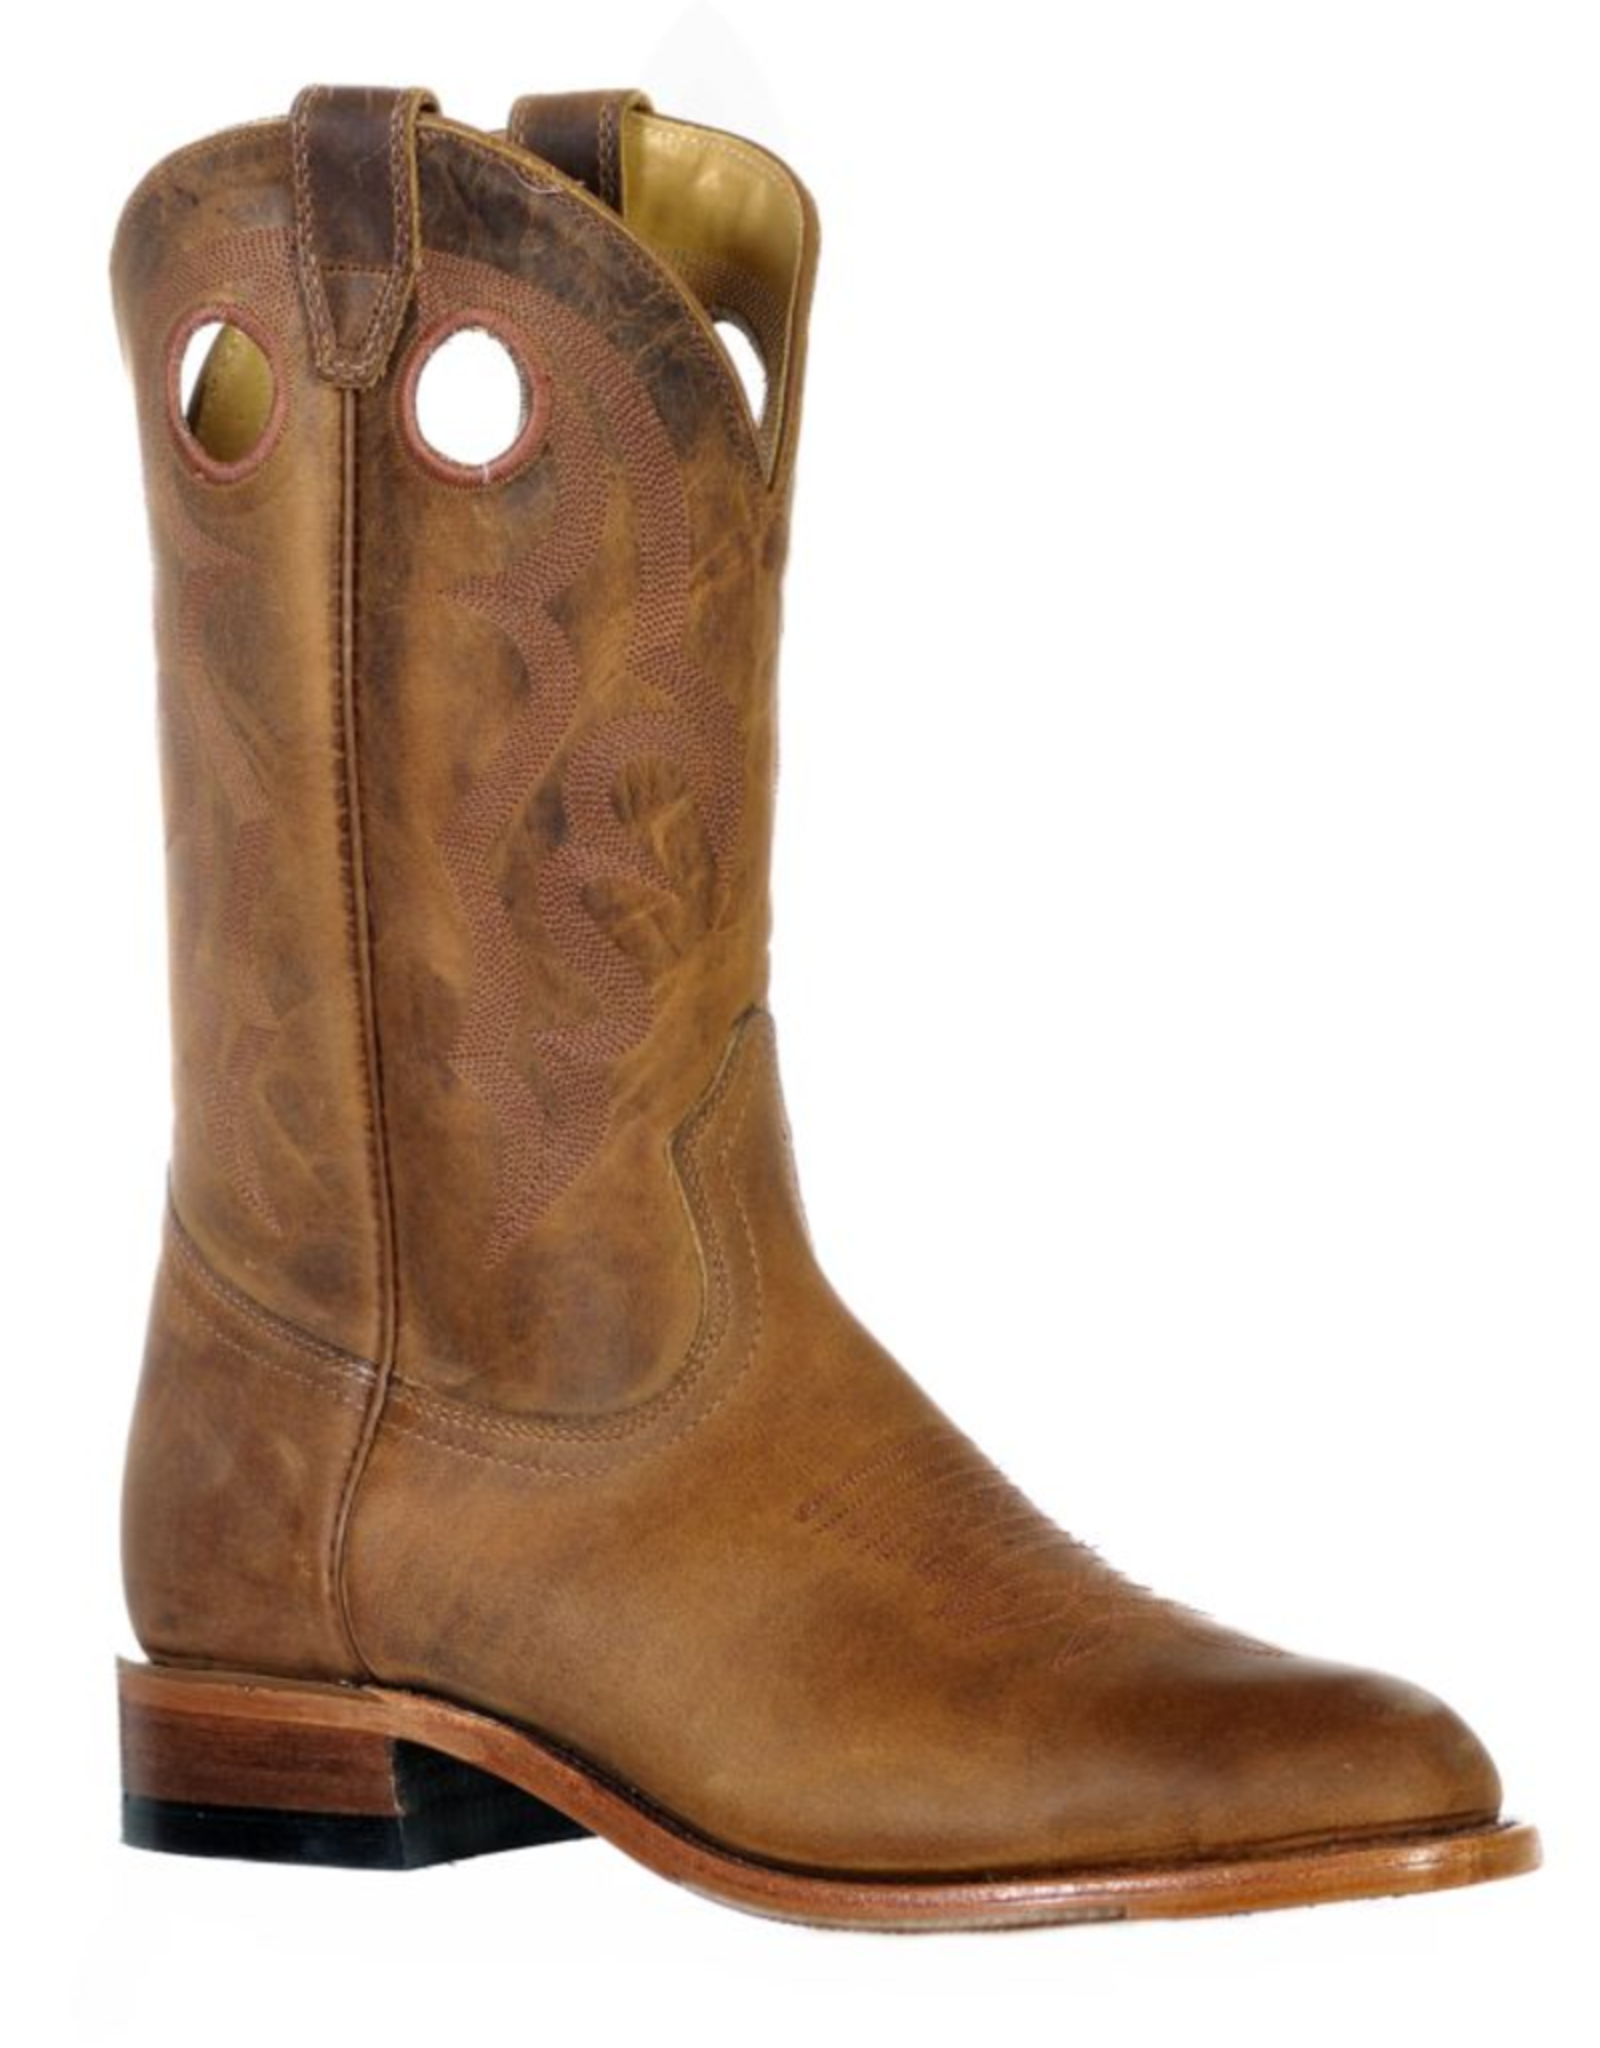 Boulet Boulet Round Toe Roper Boots